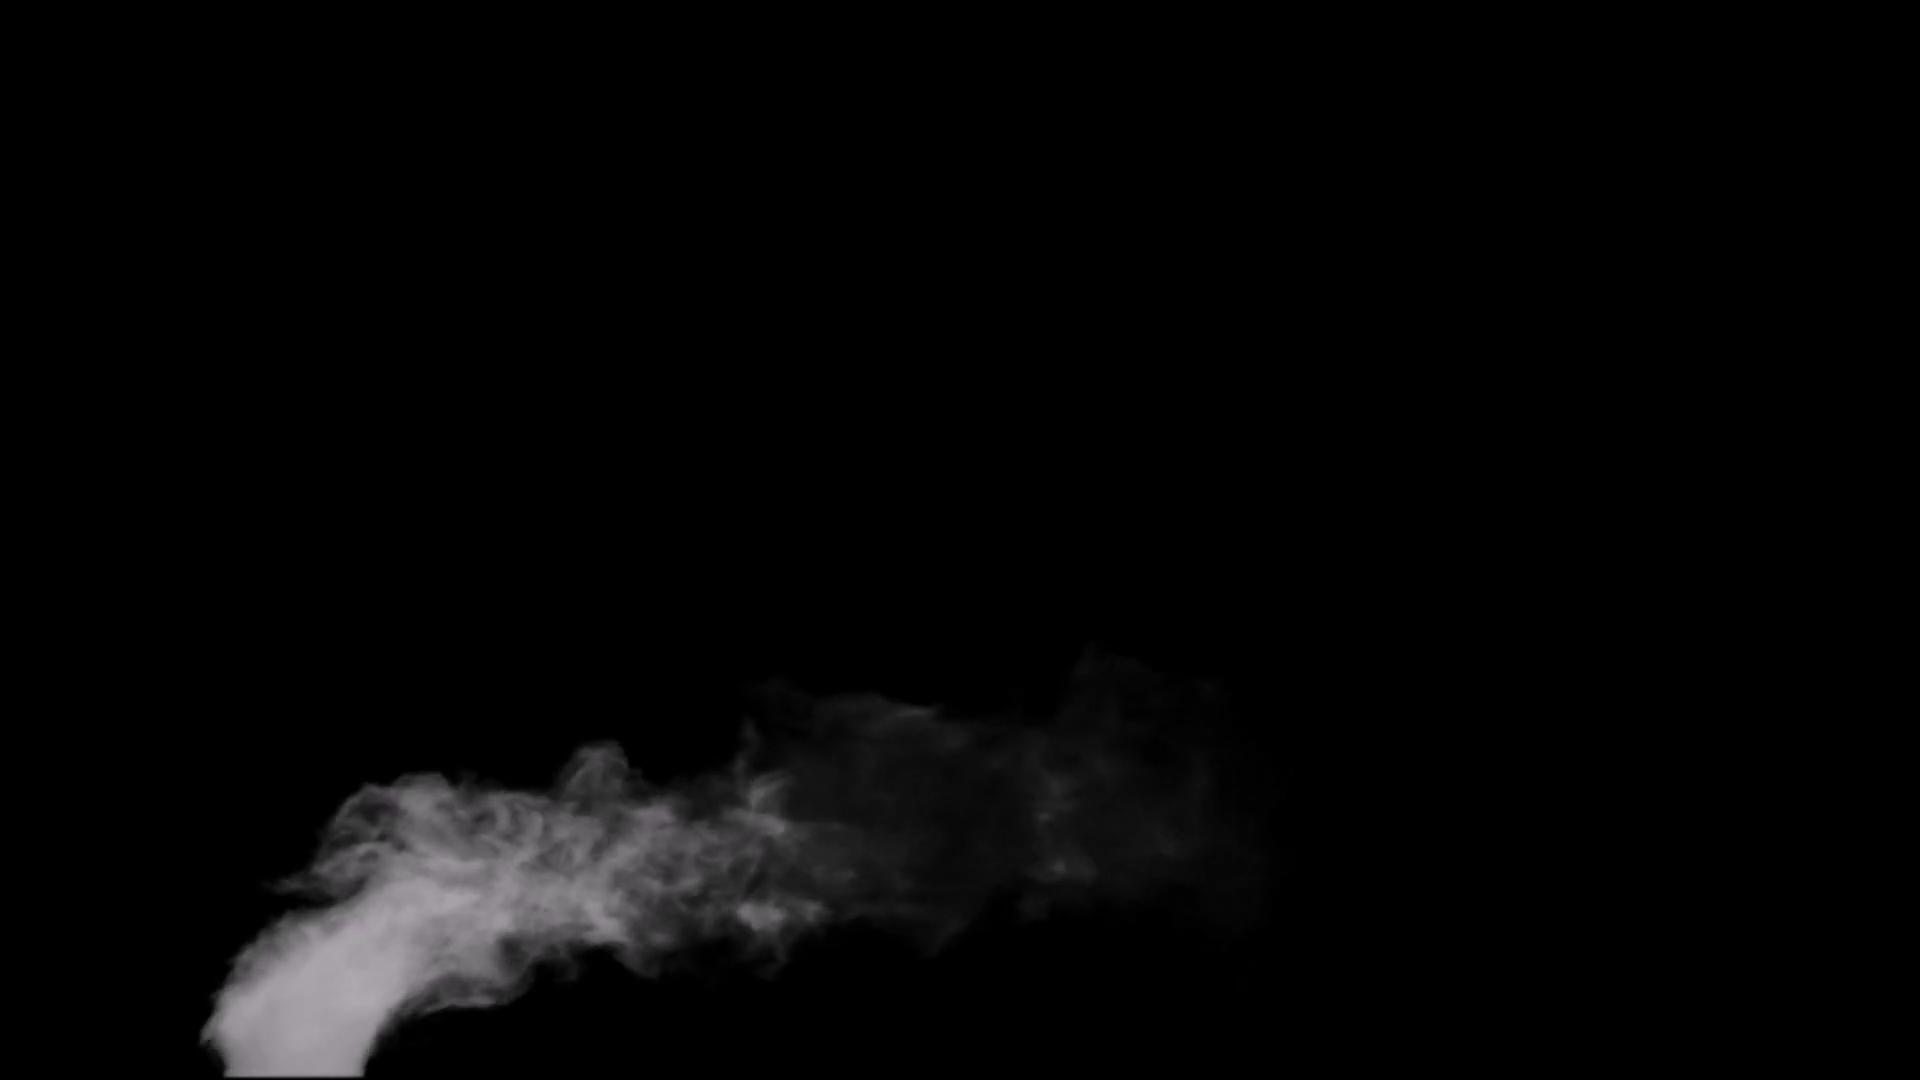 Design Elements Chimney Like Smoke Effect 2 Stock Video Footage.